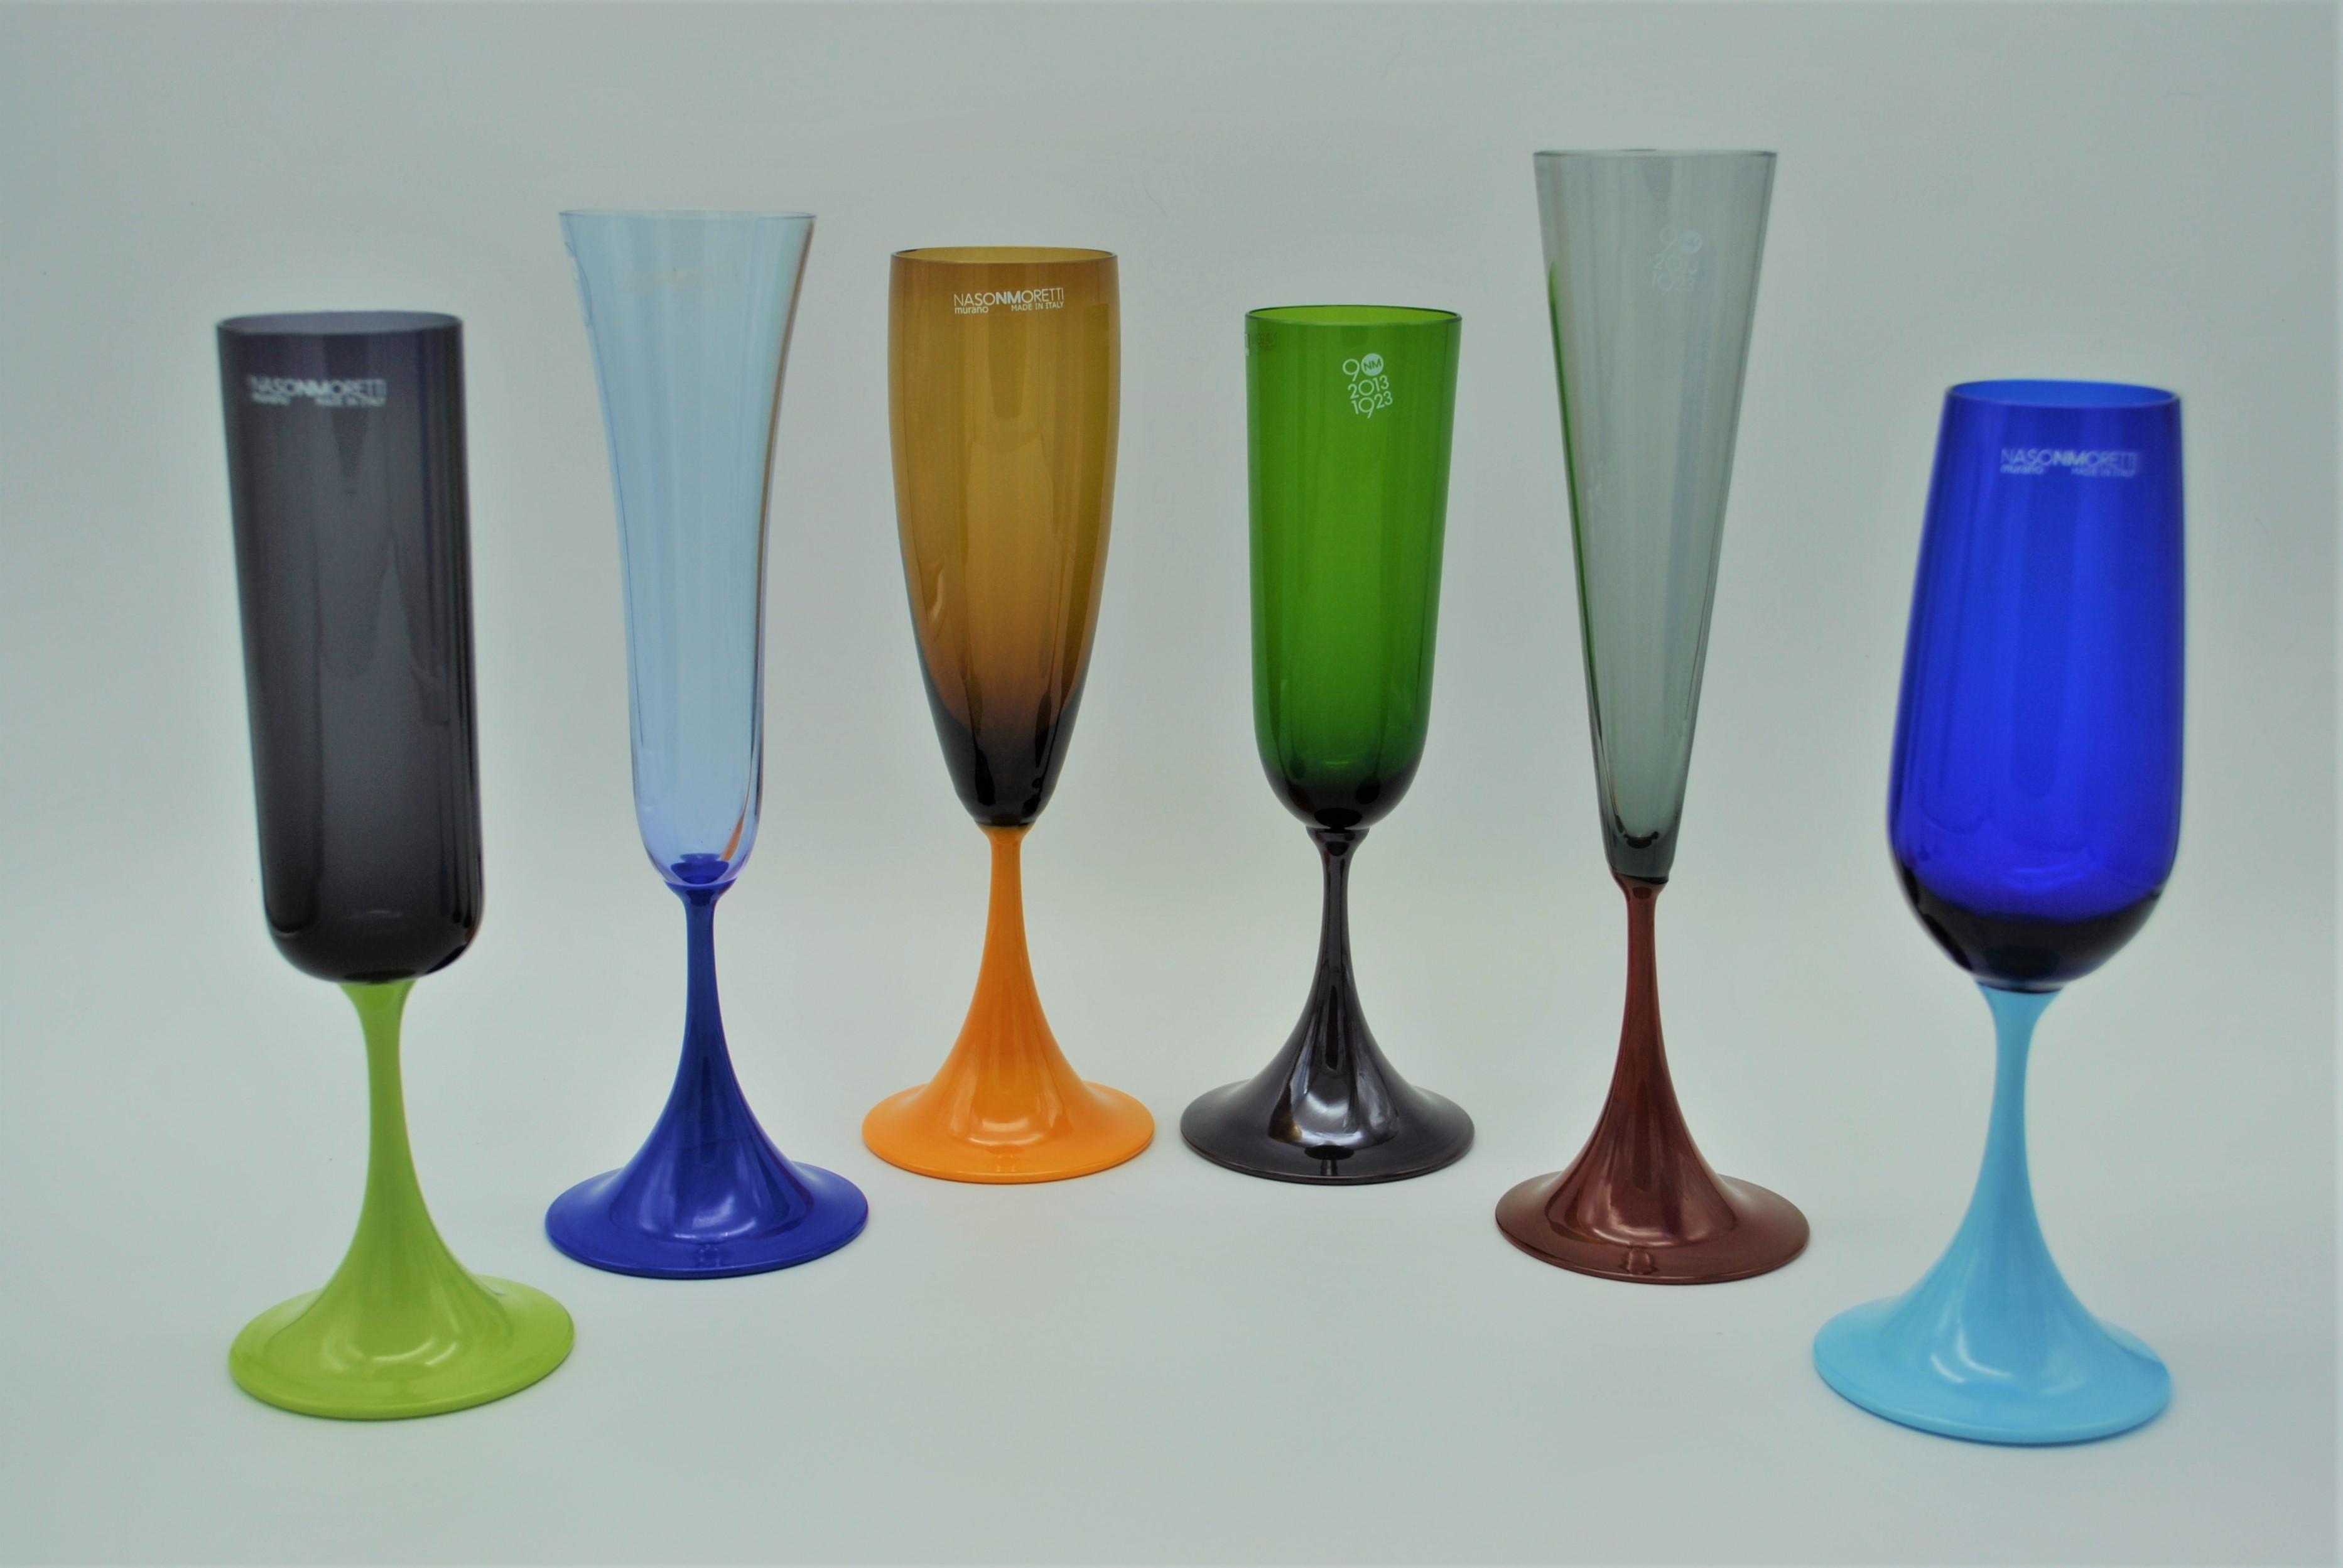 632551aaa7390 NasonMoretti Guepiere Flute Glasses